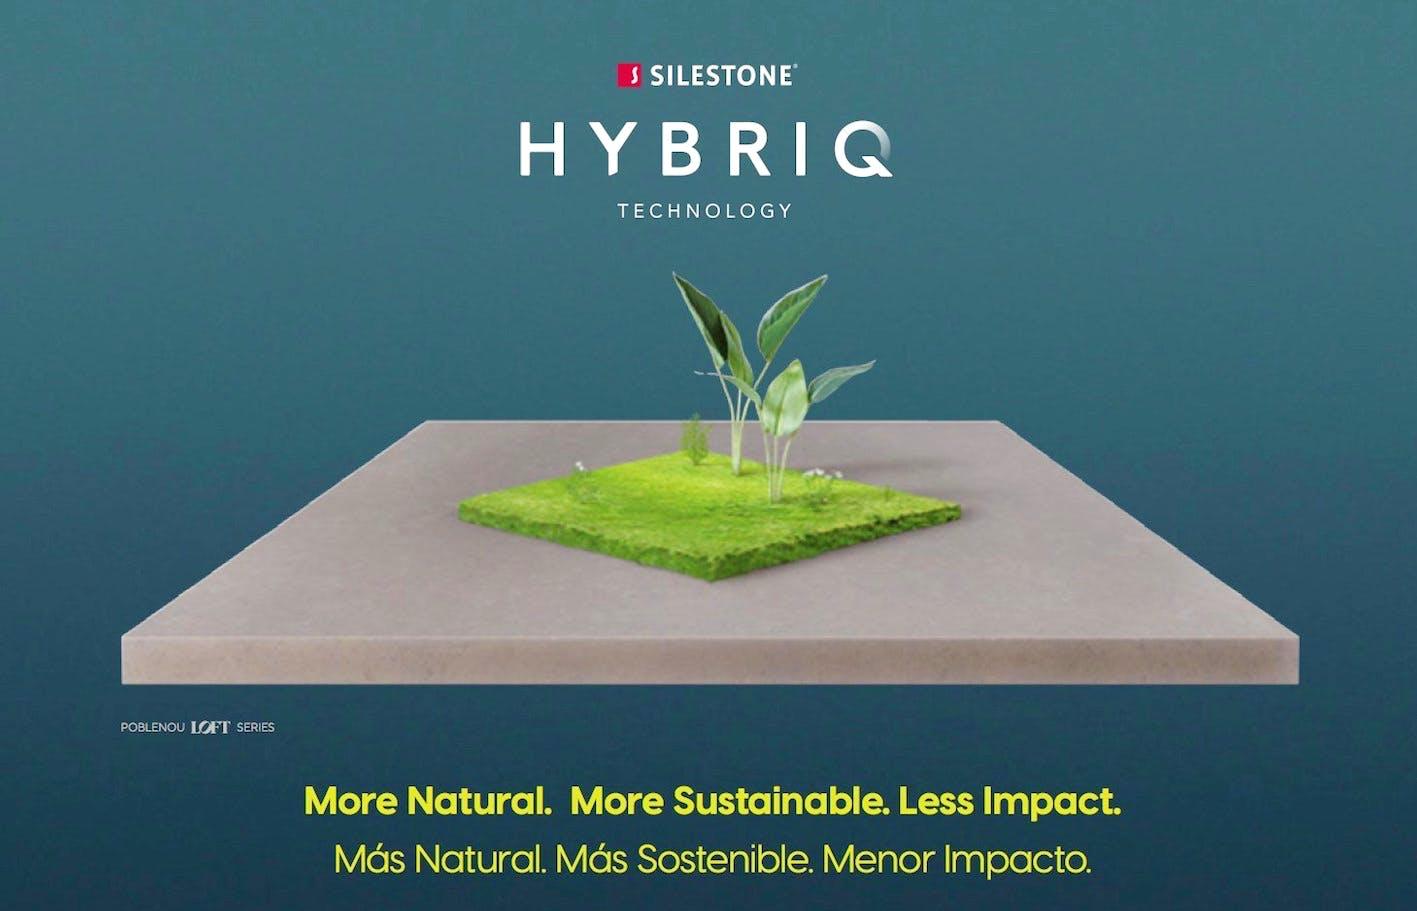 Image of Silestone HybriQ 21 5 in Cosentino Group reports strong results in 2020 - Cosentino